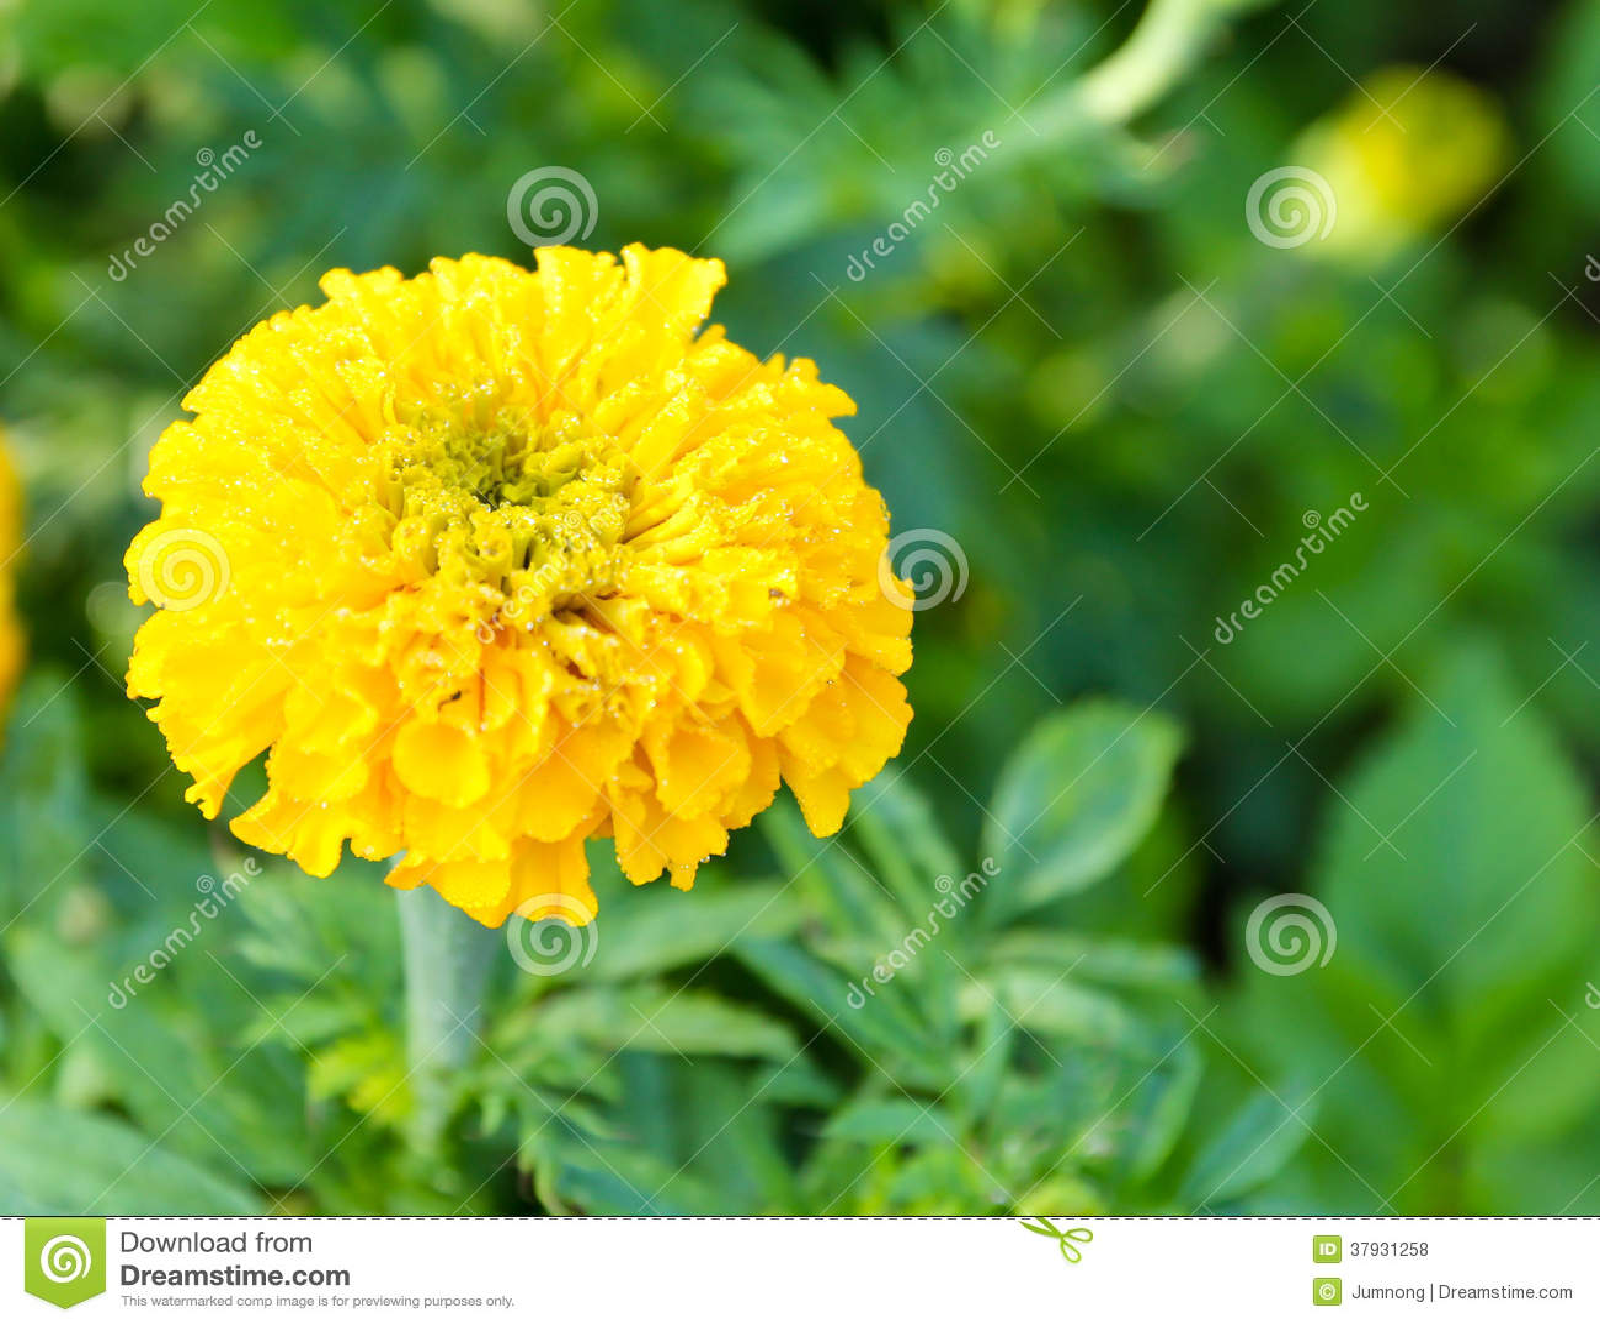 Marigold in the flower farm